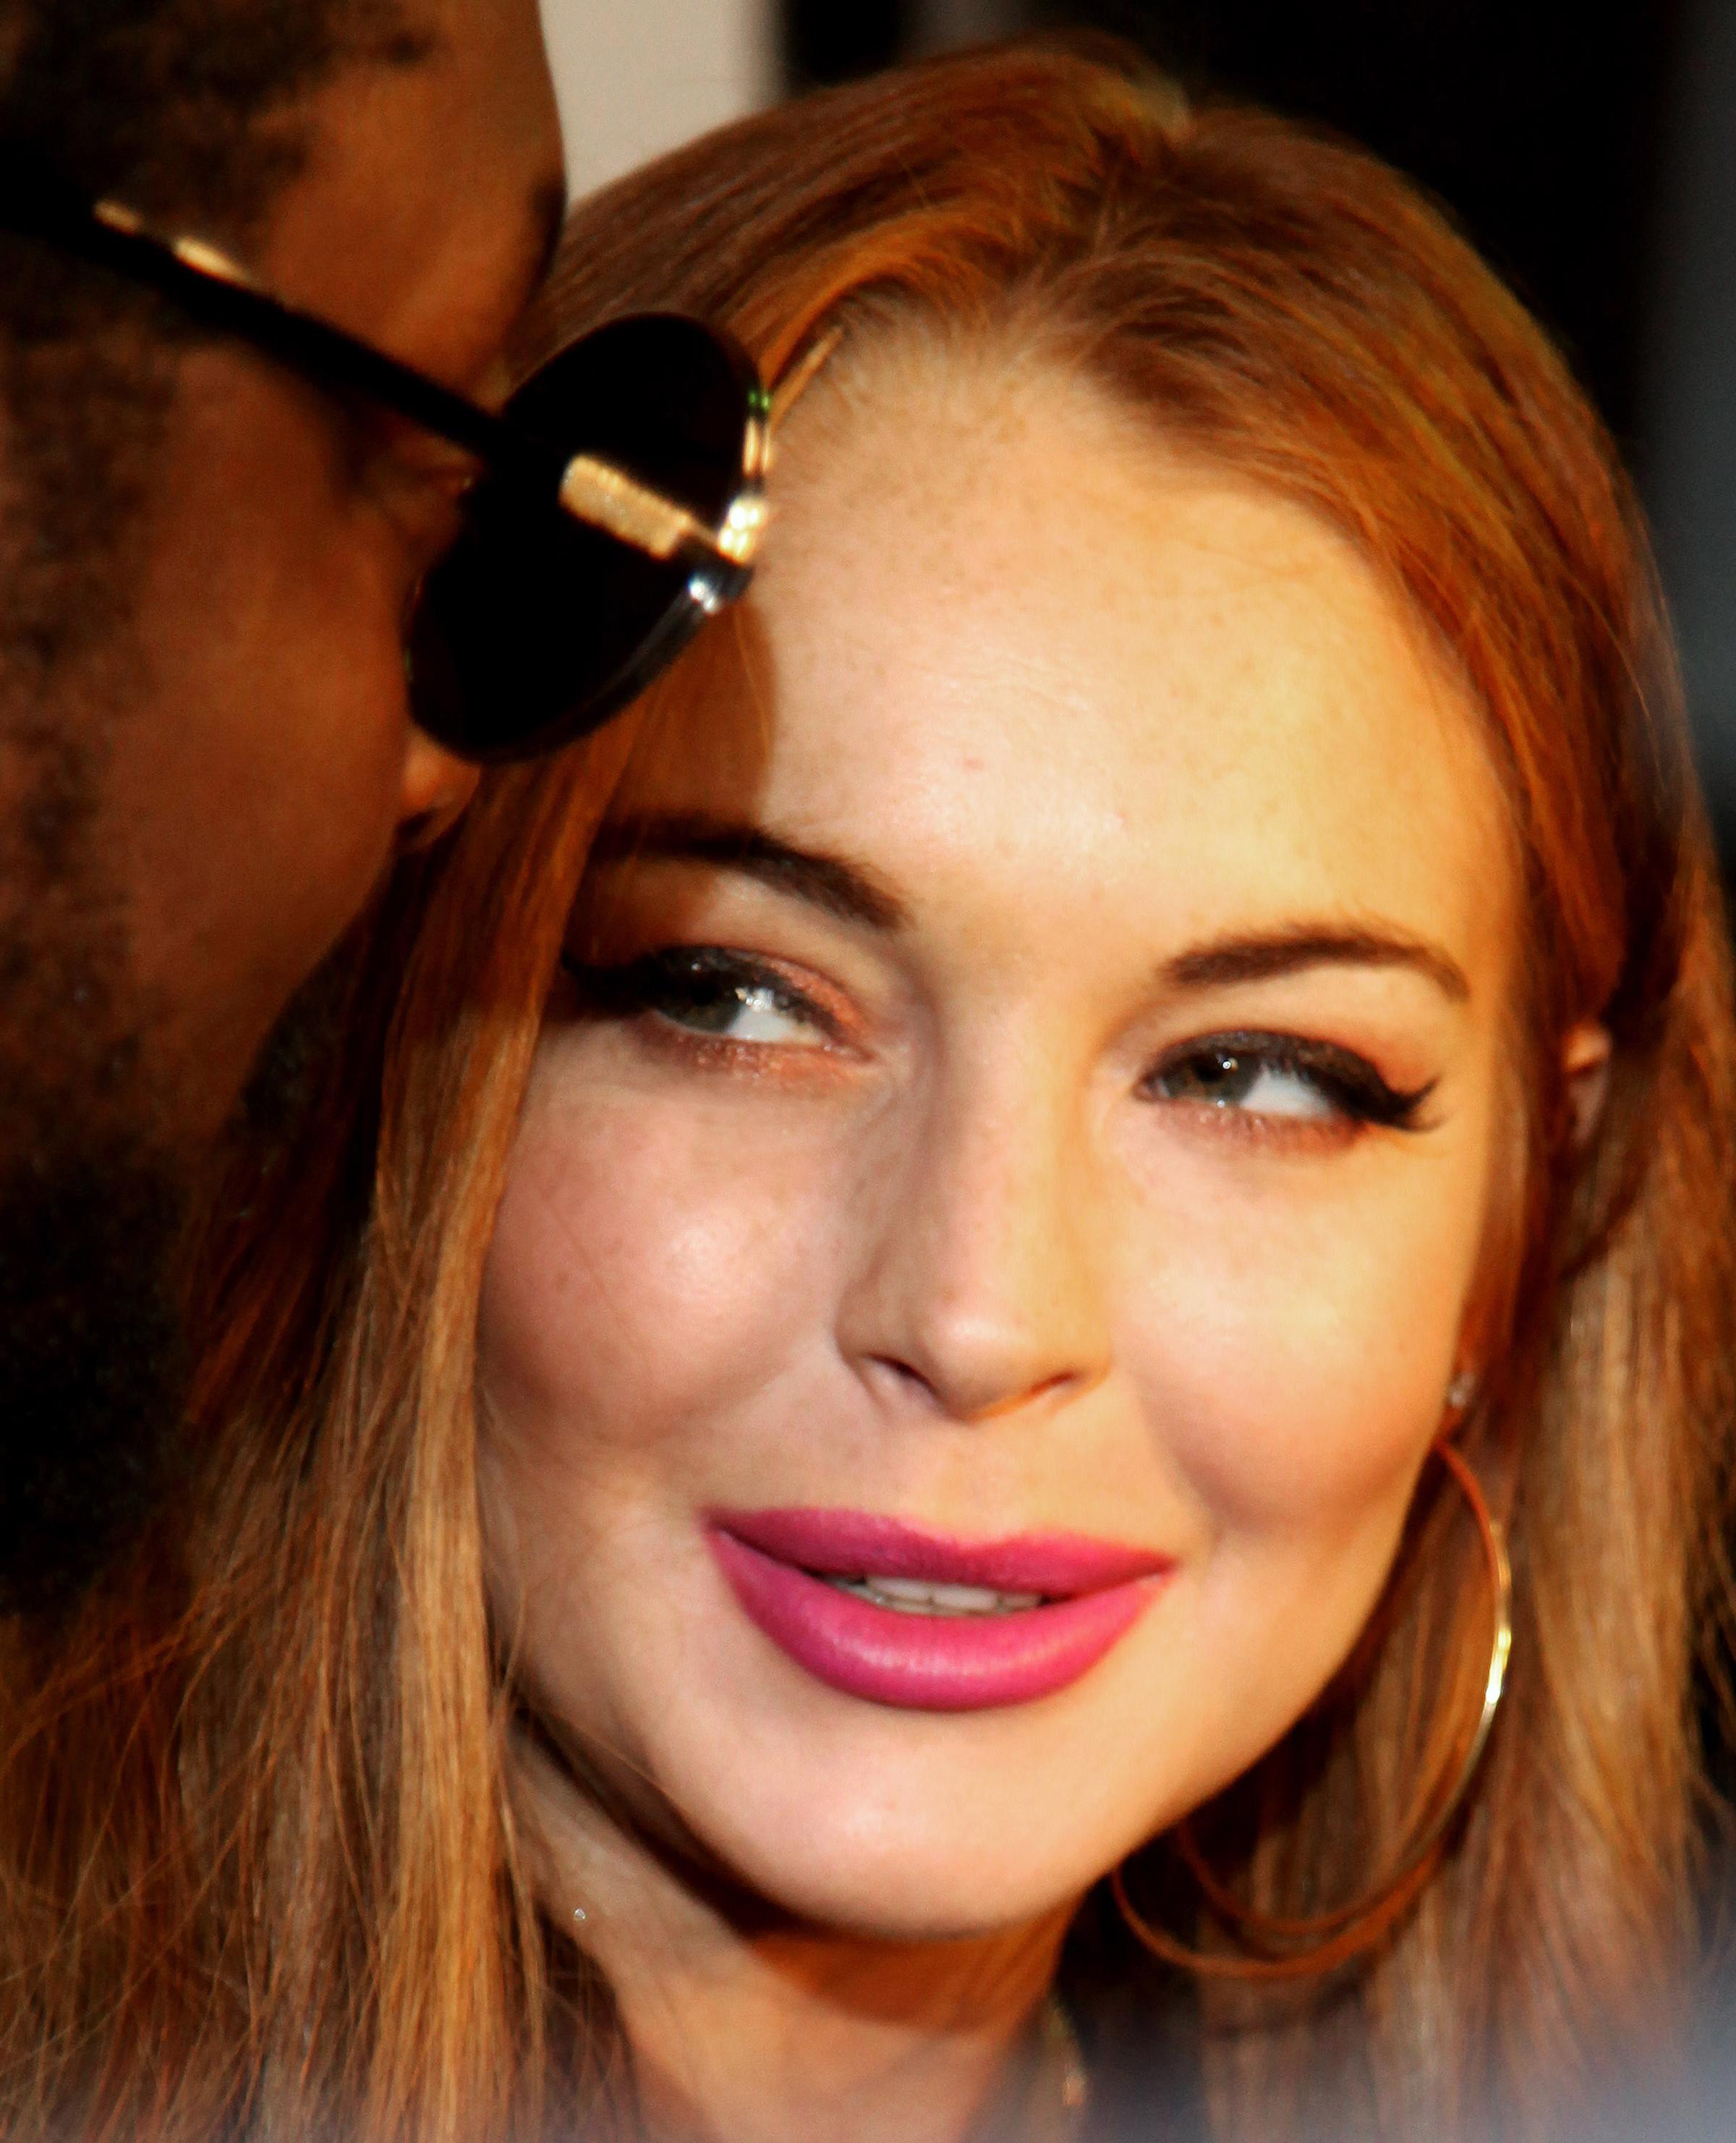 Lindsay Lohan - Wikipedia, the free encyclopedia